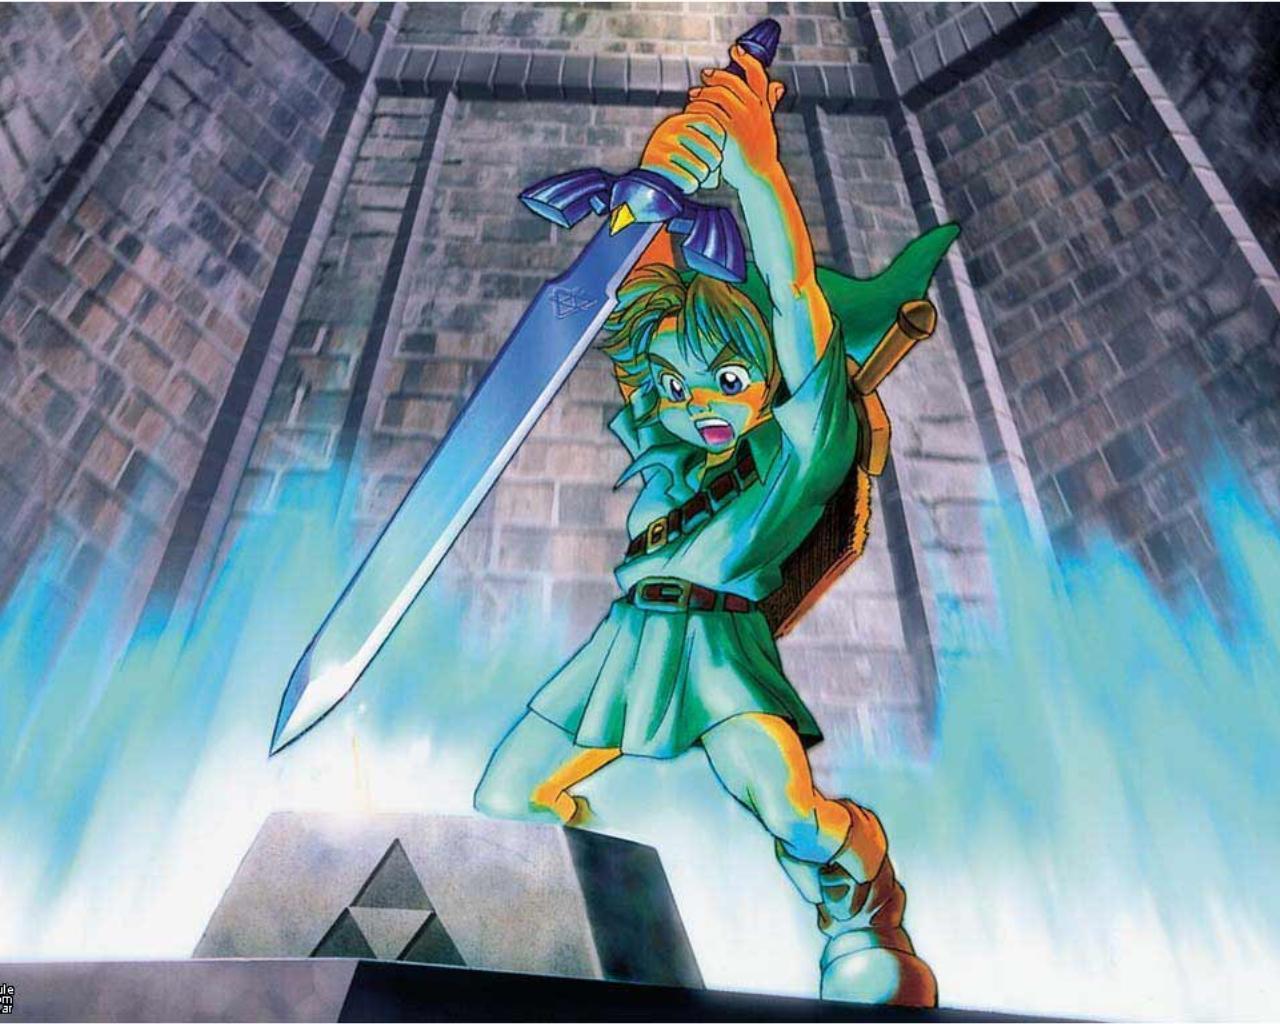 Ocarina Of Time 3d Wallpaper 32 Wallpapers Adorable